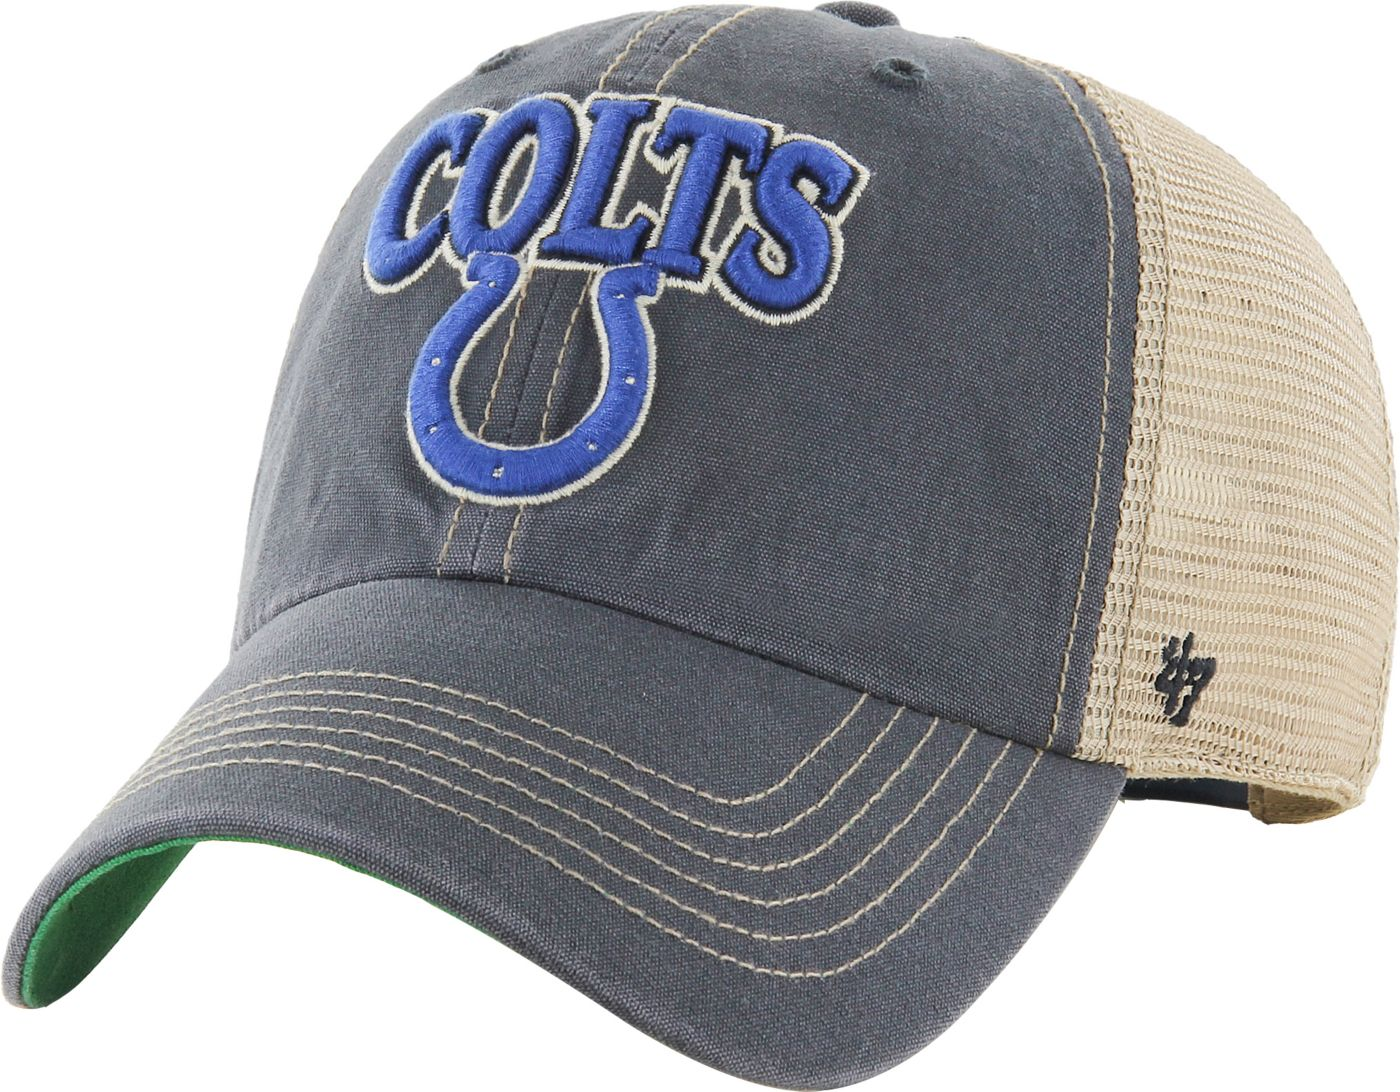 '47 Men's Indianapolis Colts Vintage Tuscaloosa Navy Adjustable Hat